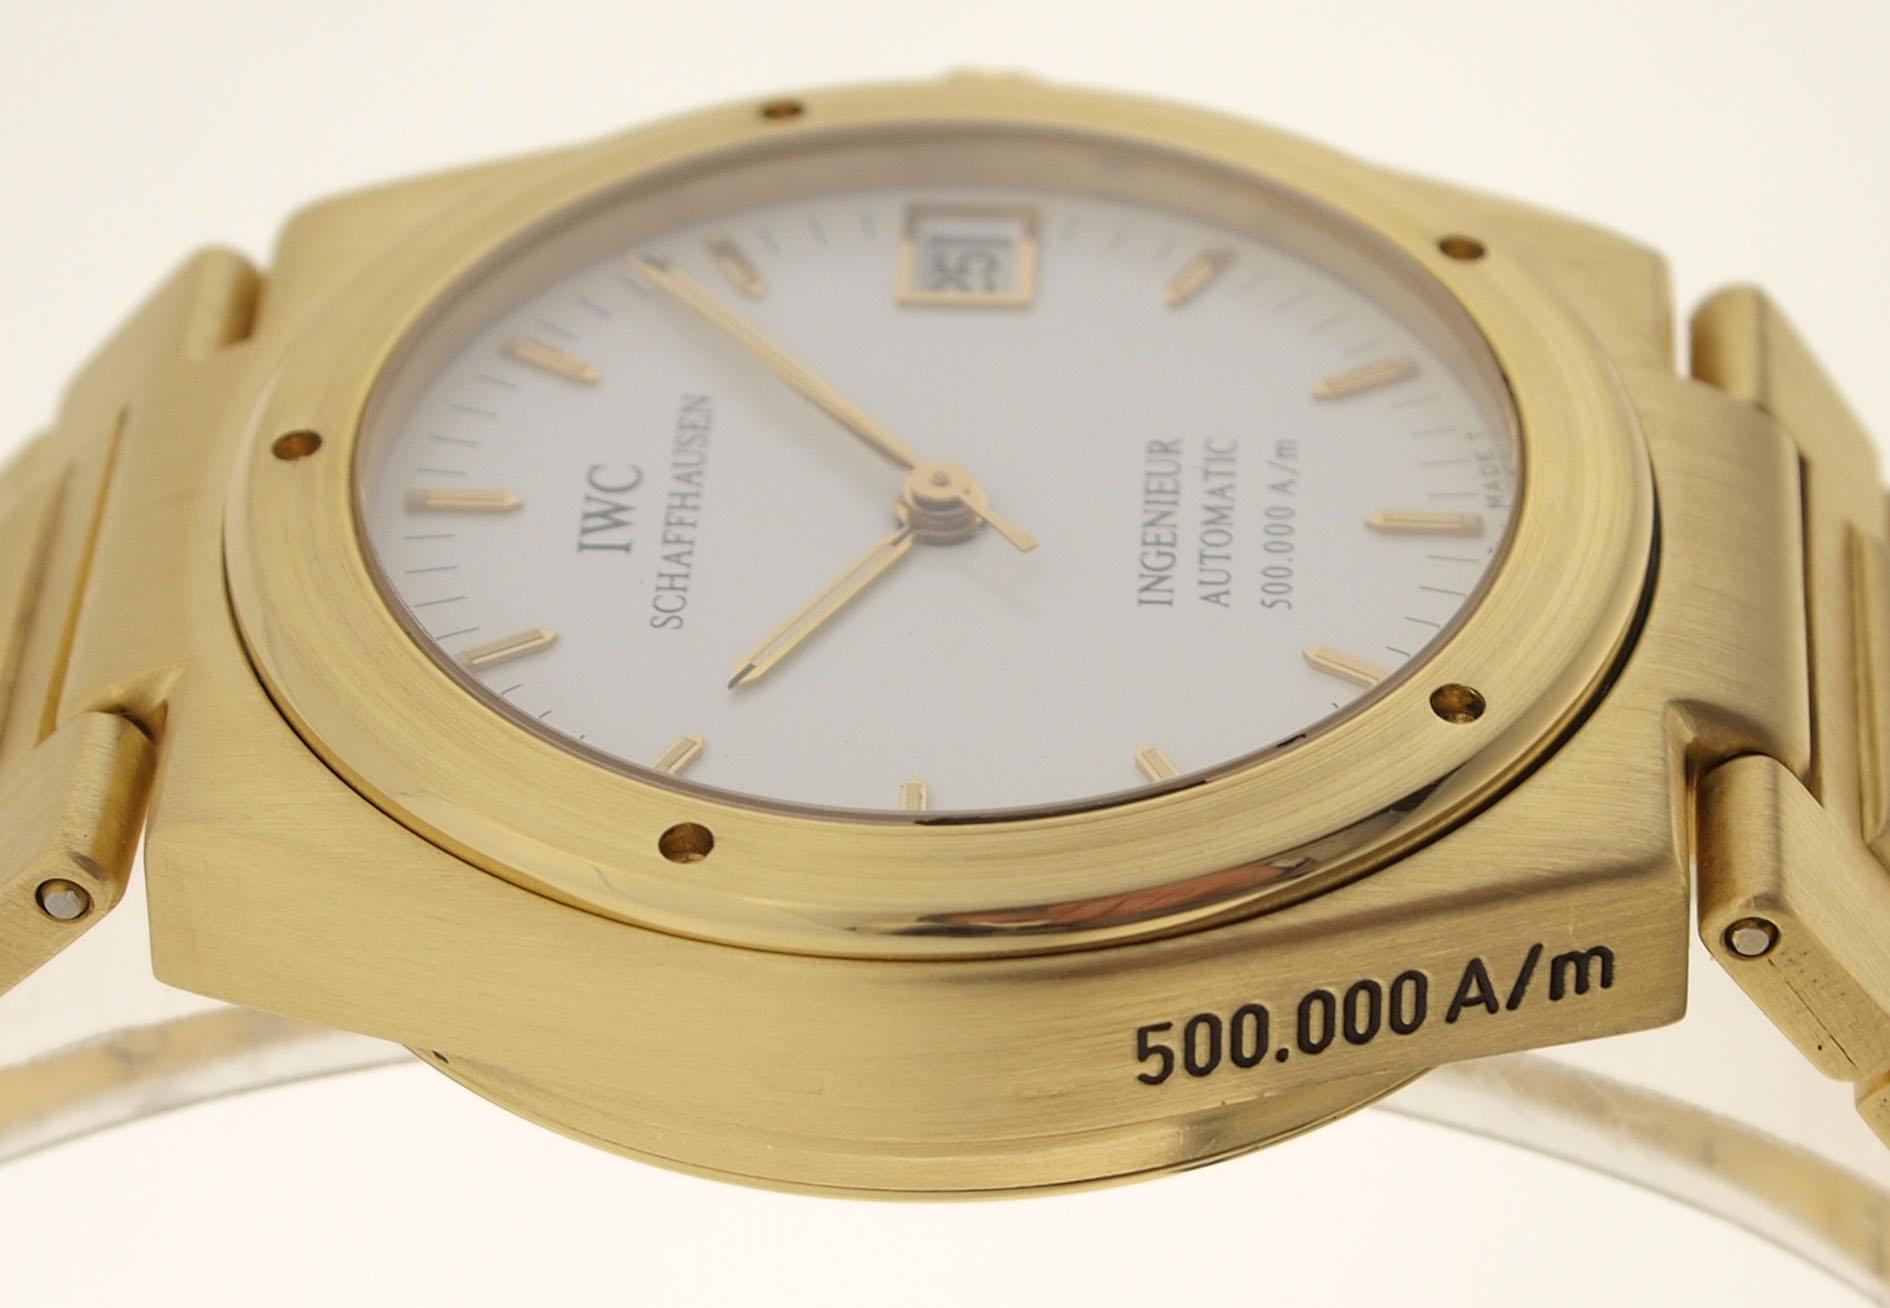 Iwc Ingenieur Automatic 500.000 A M